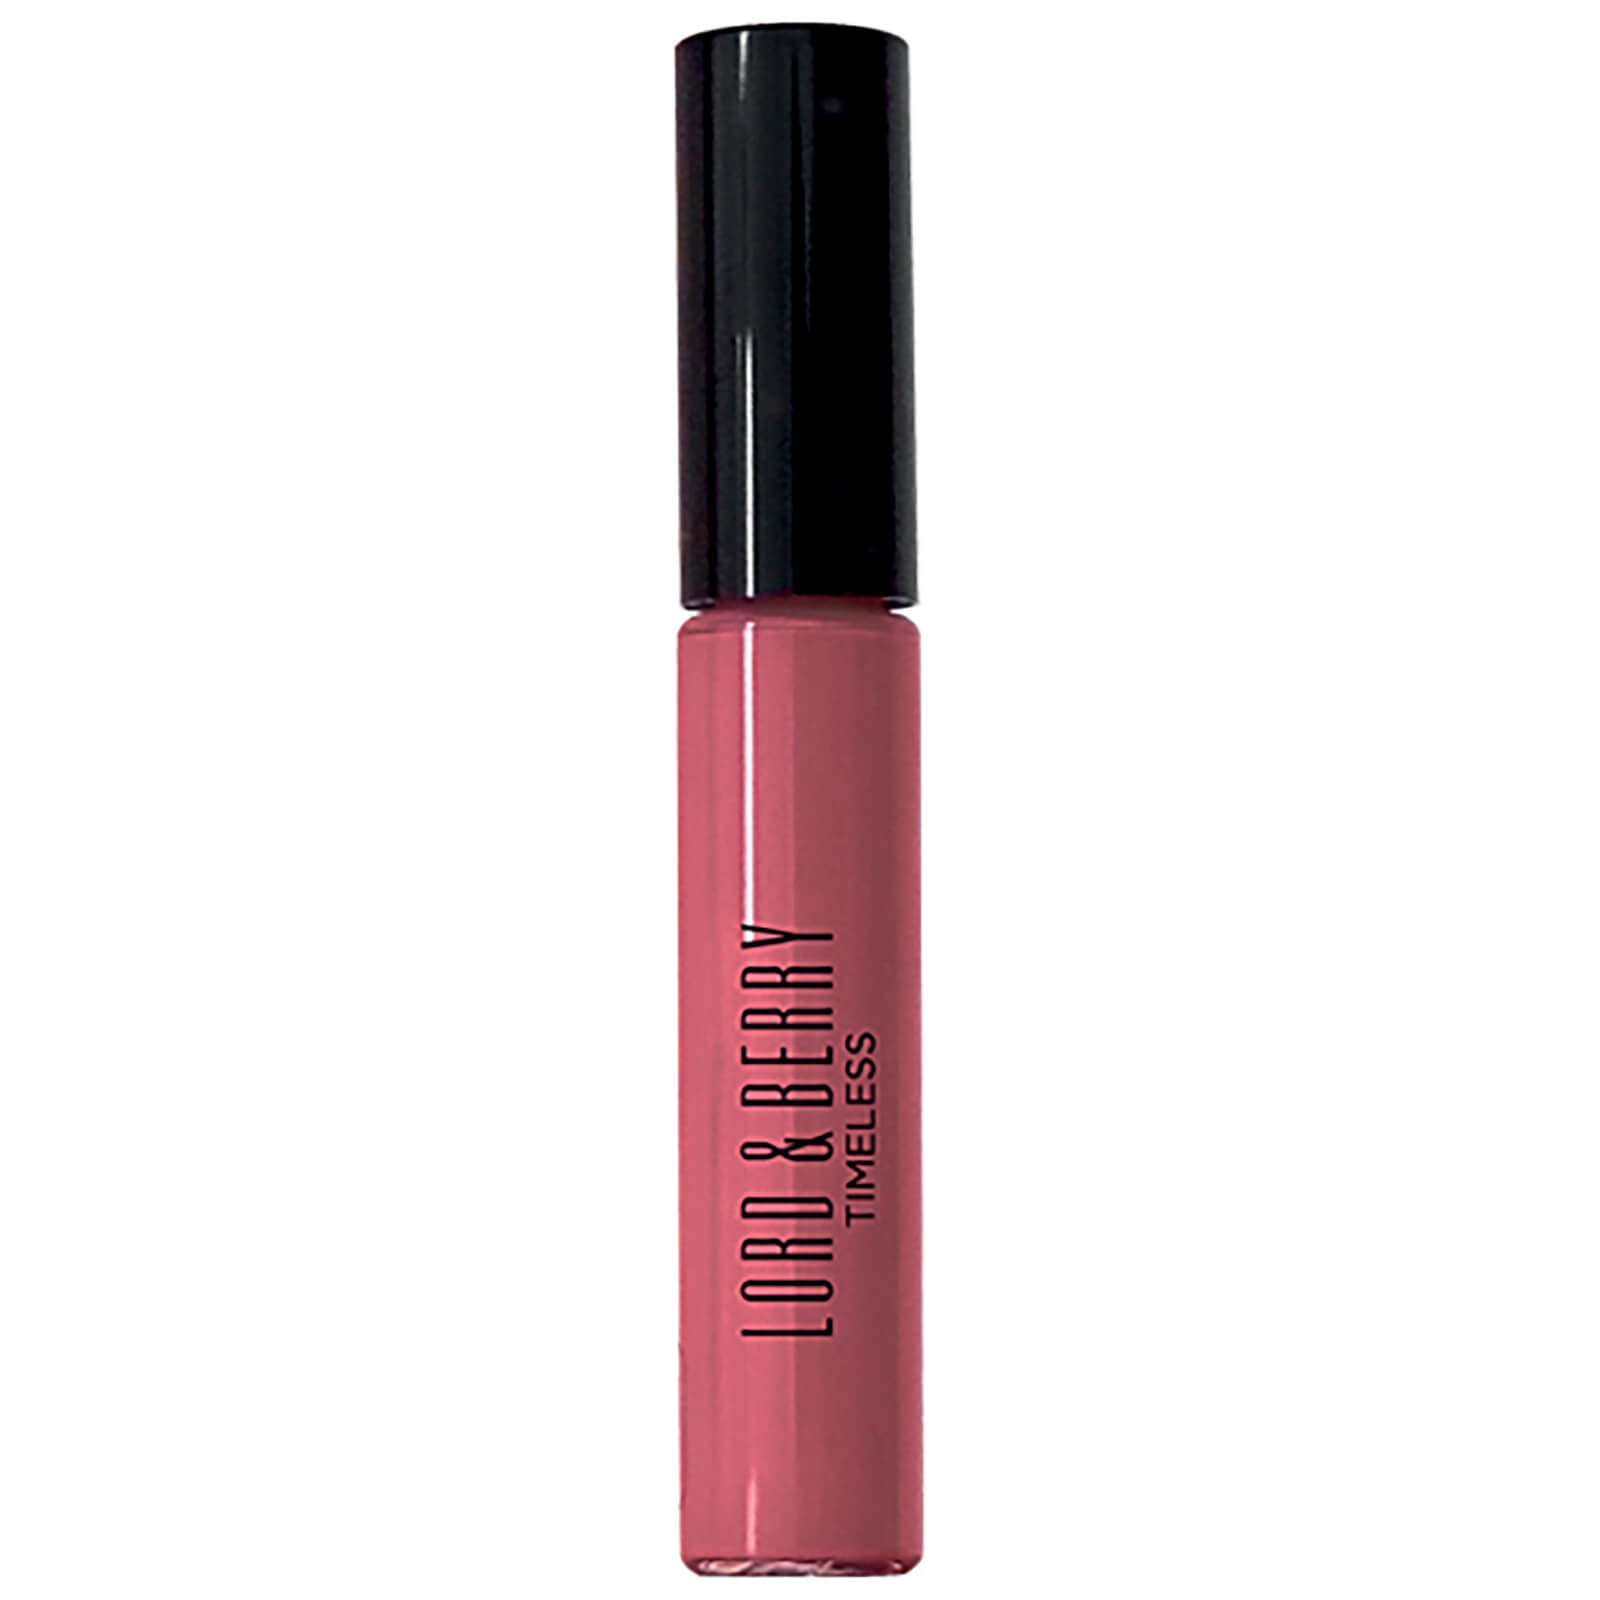 Купить Lord & Berry Timeless Kissproof Lipstick Помада для губ - Muse